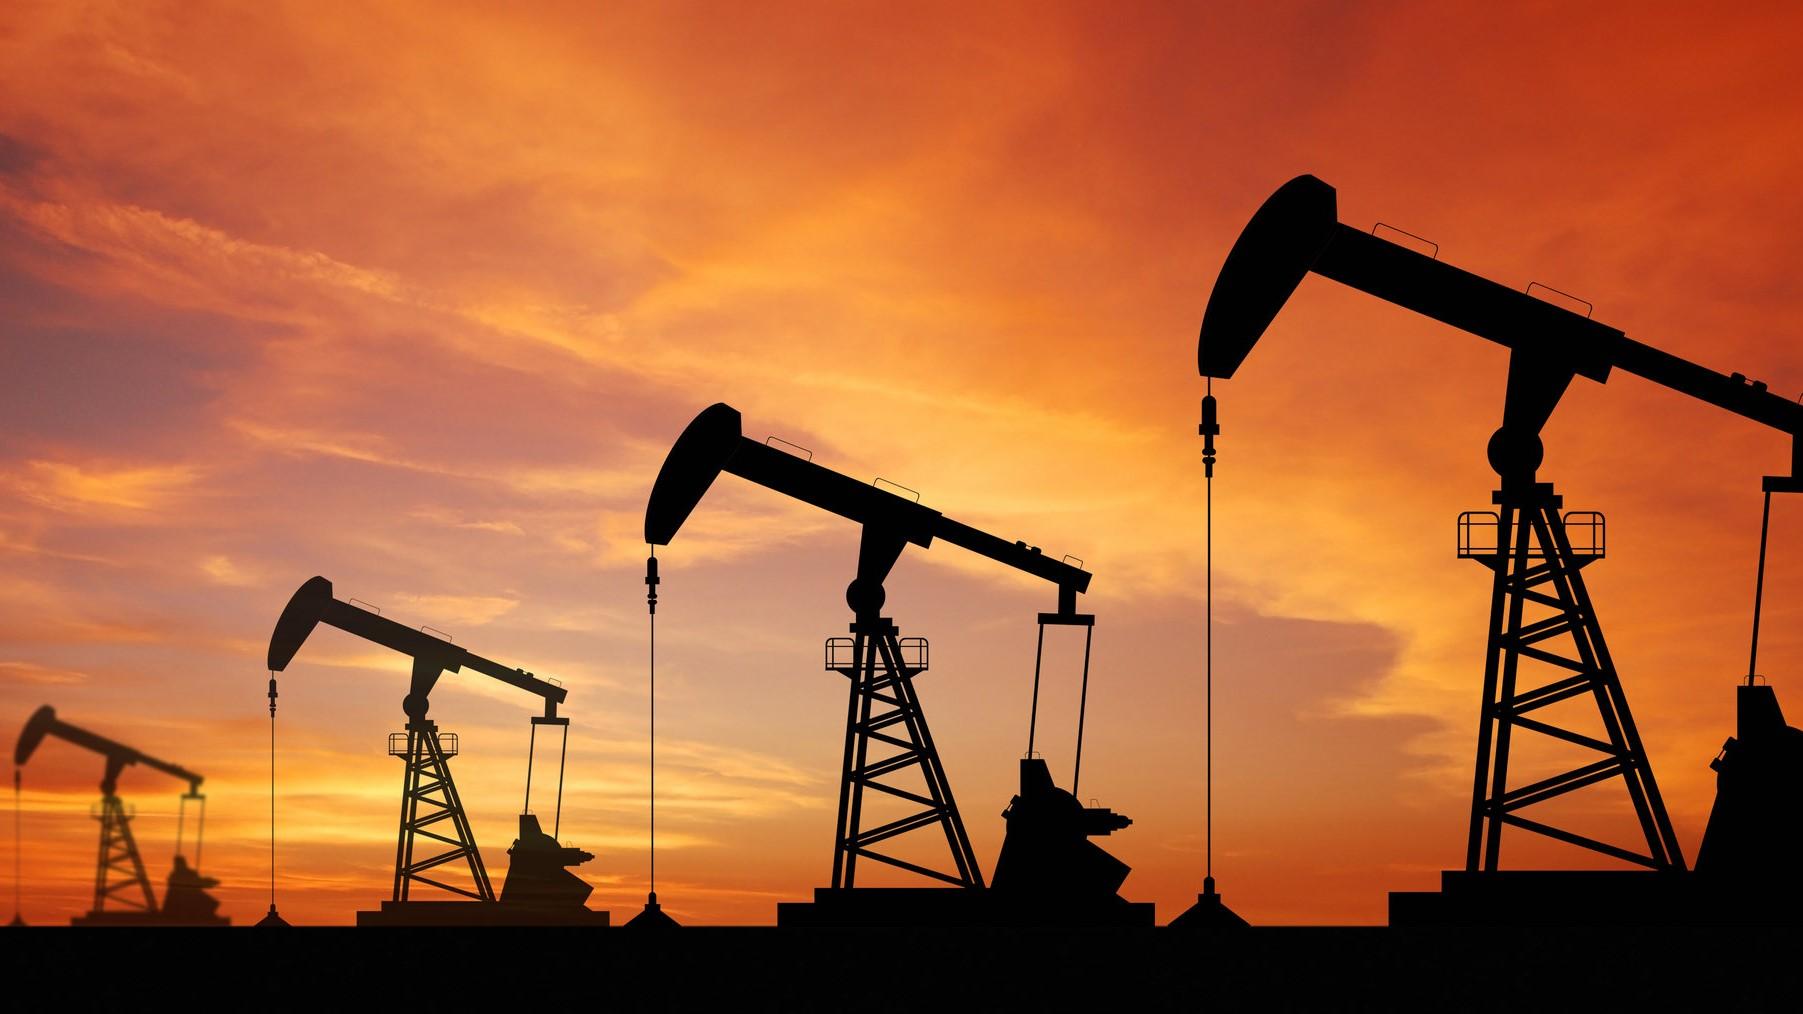 Crude oil demand in danger due to China economic slowdown 3